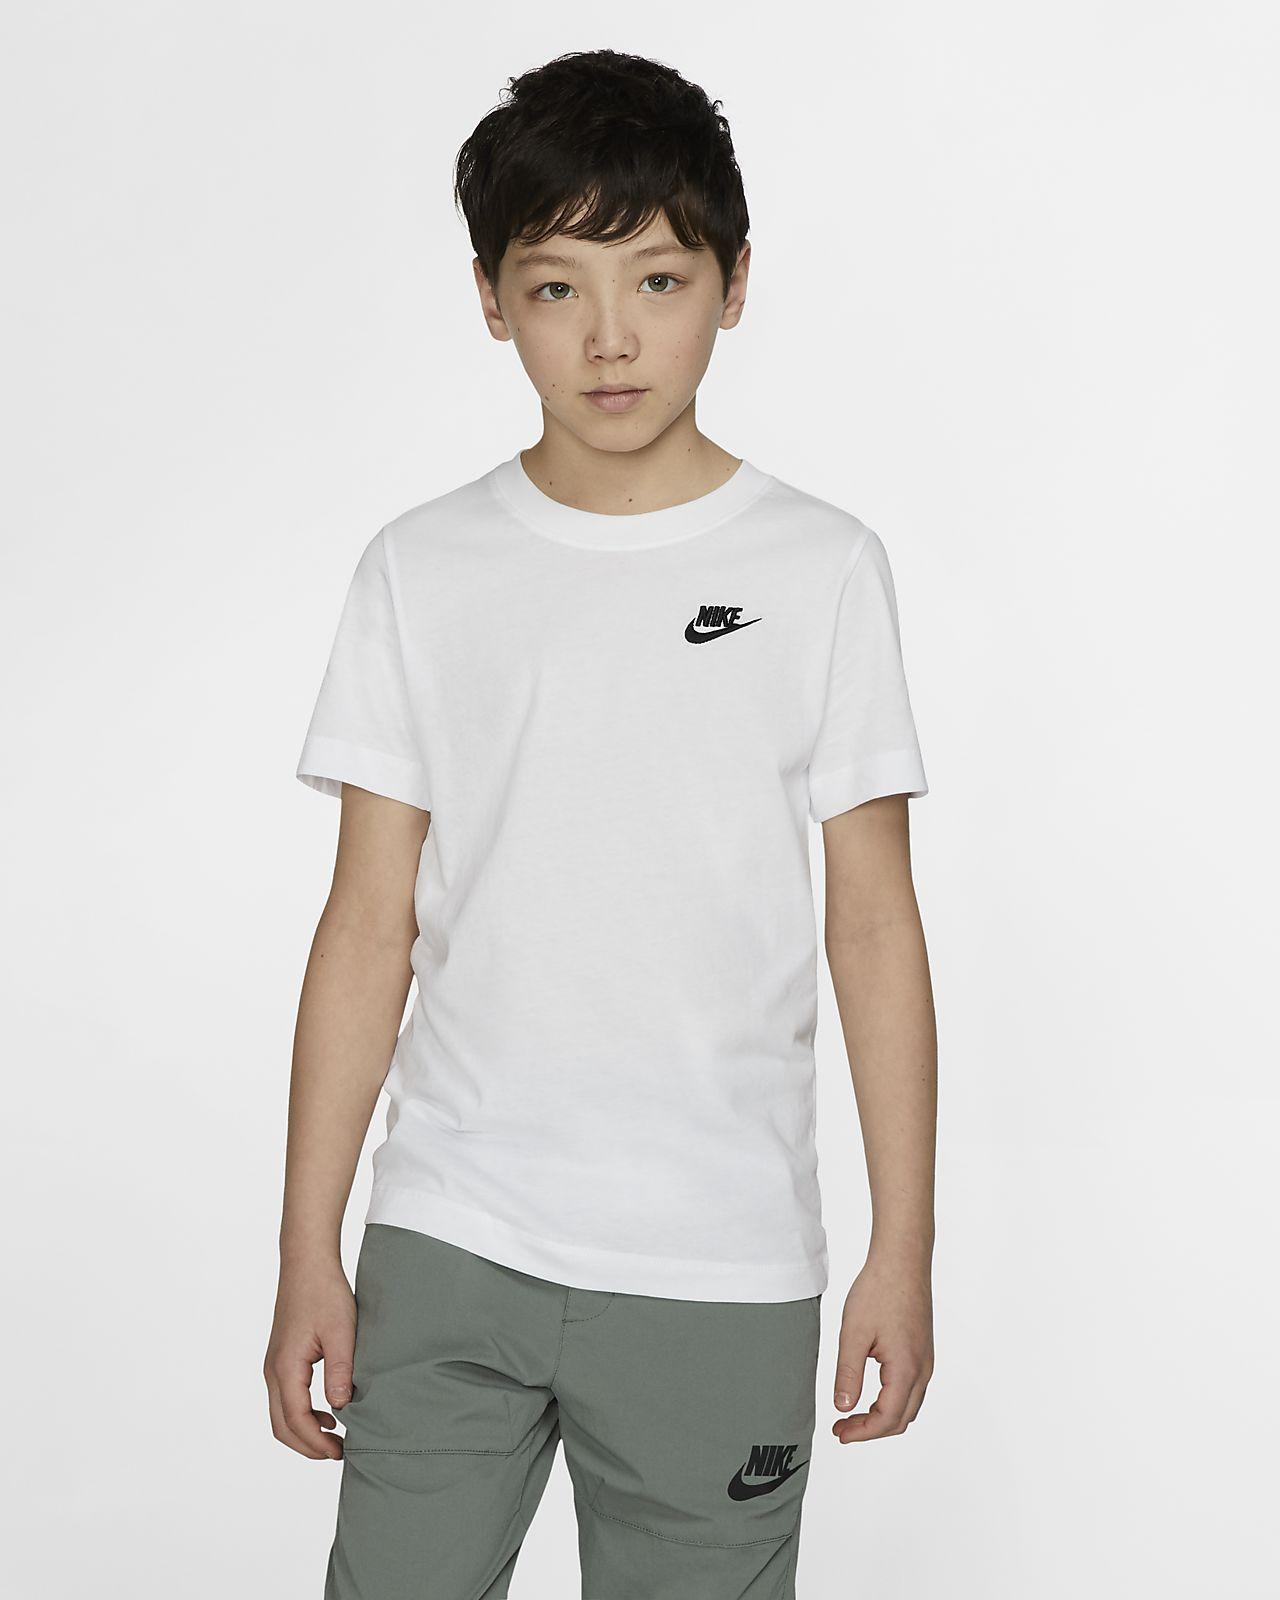 tee shirt nike enfant